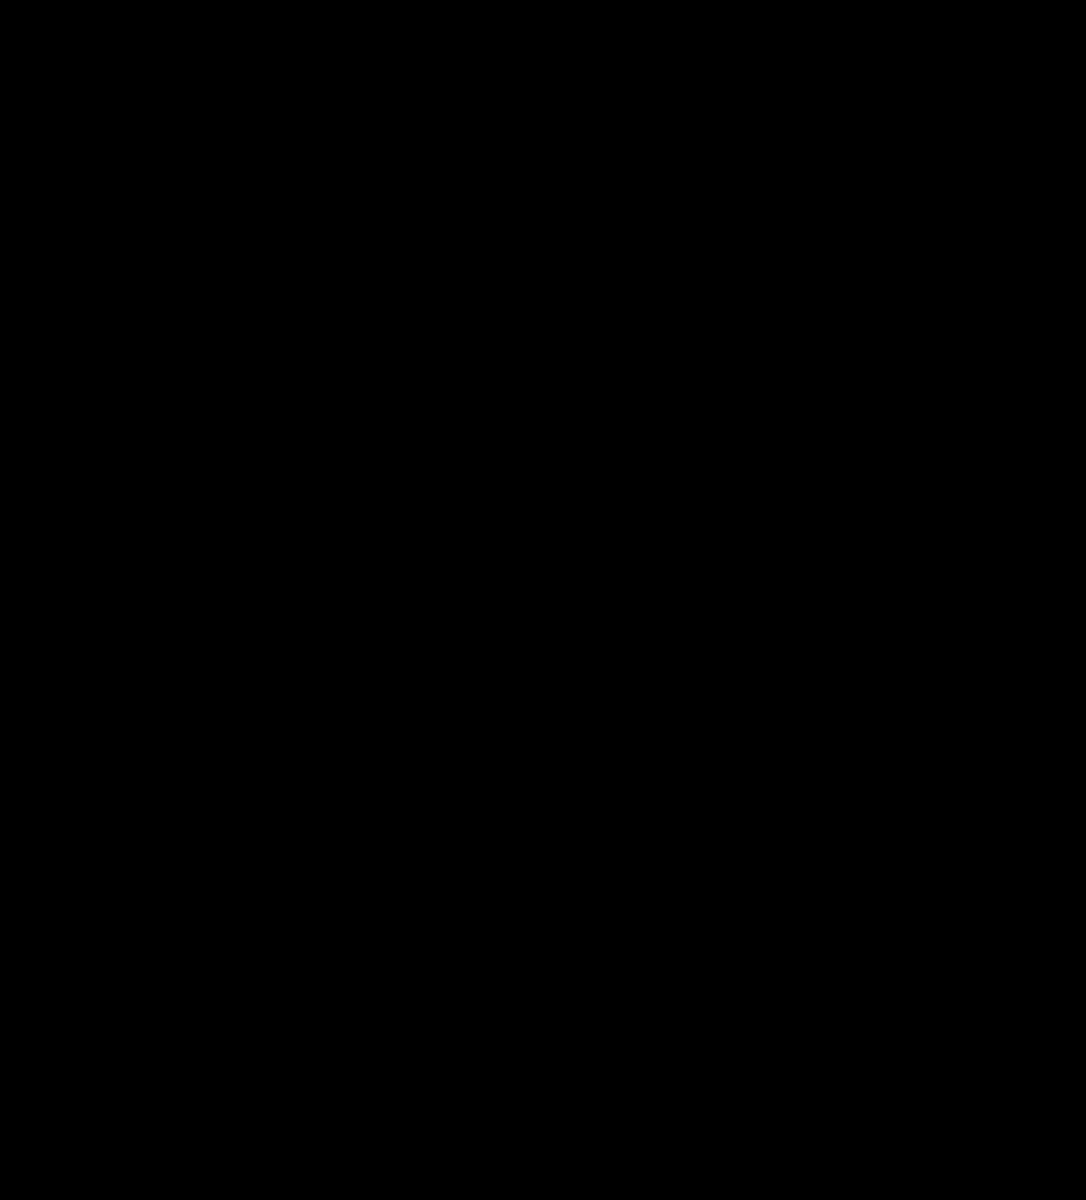 f:id:osadaken:20200107234557p:plain